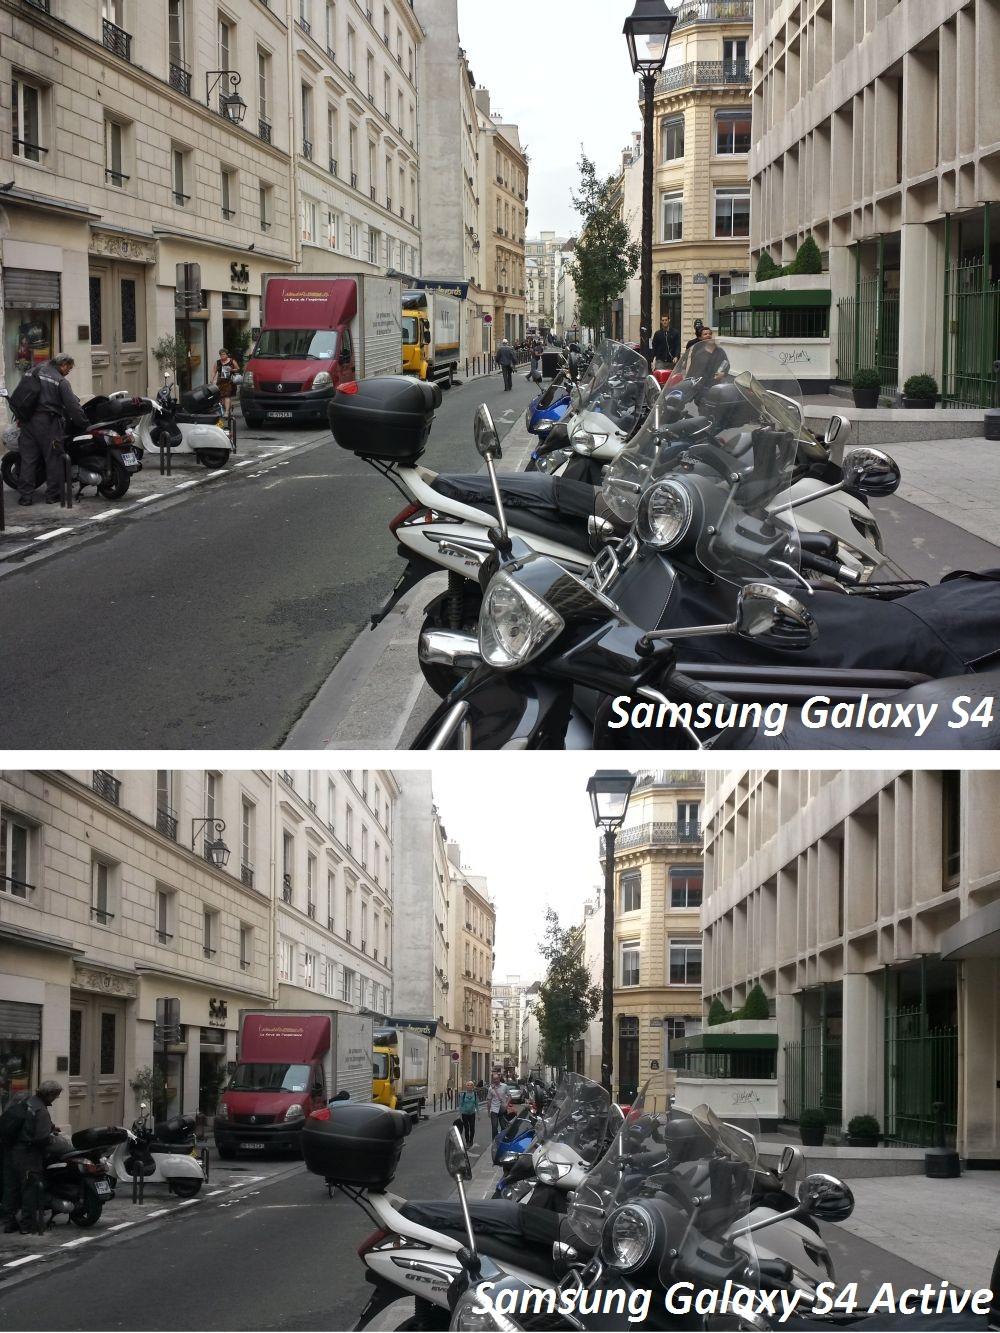 extrait android samsung galaxy s4 vs samsun galaxy s4 active test photos #1